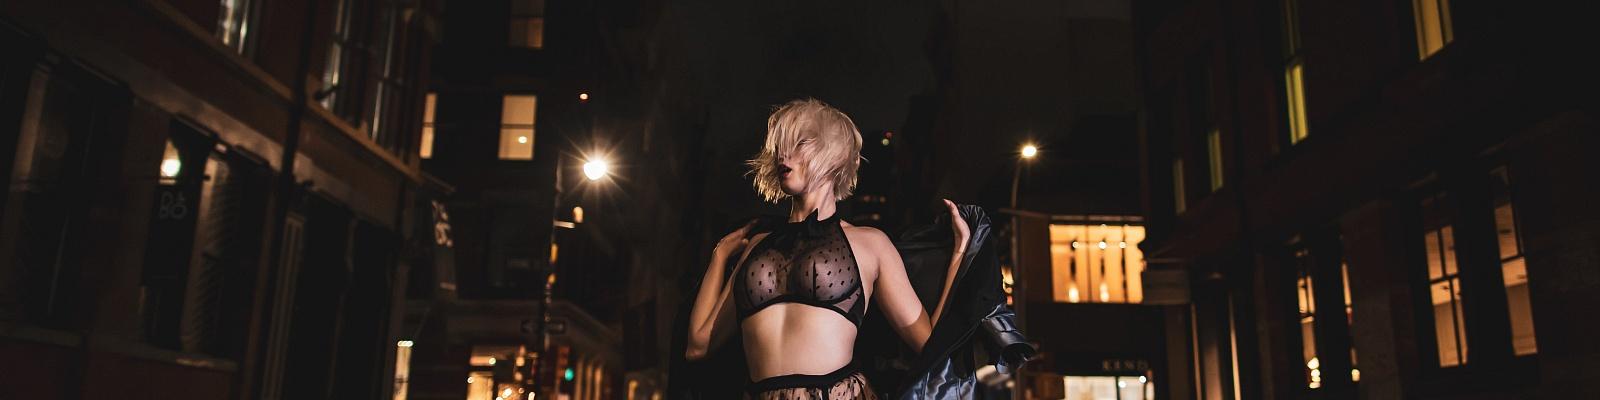 Aria Wilde's Cover Photo